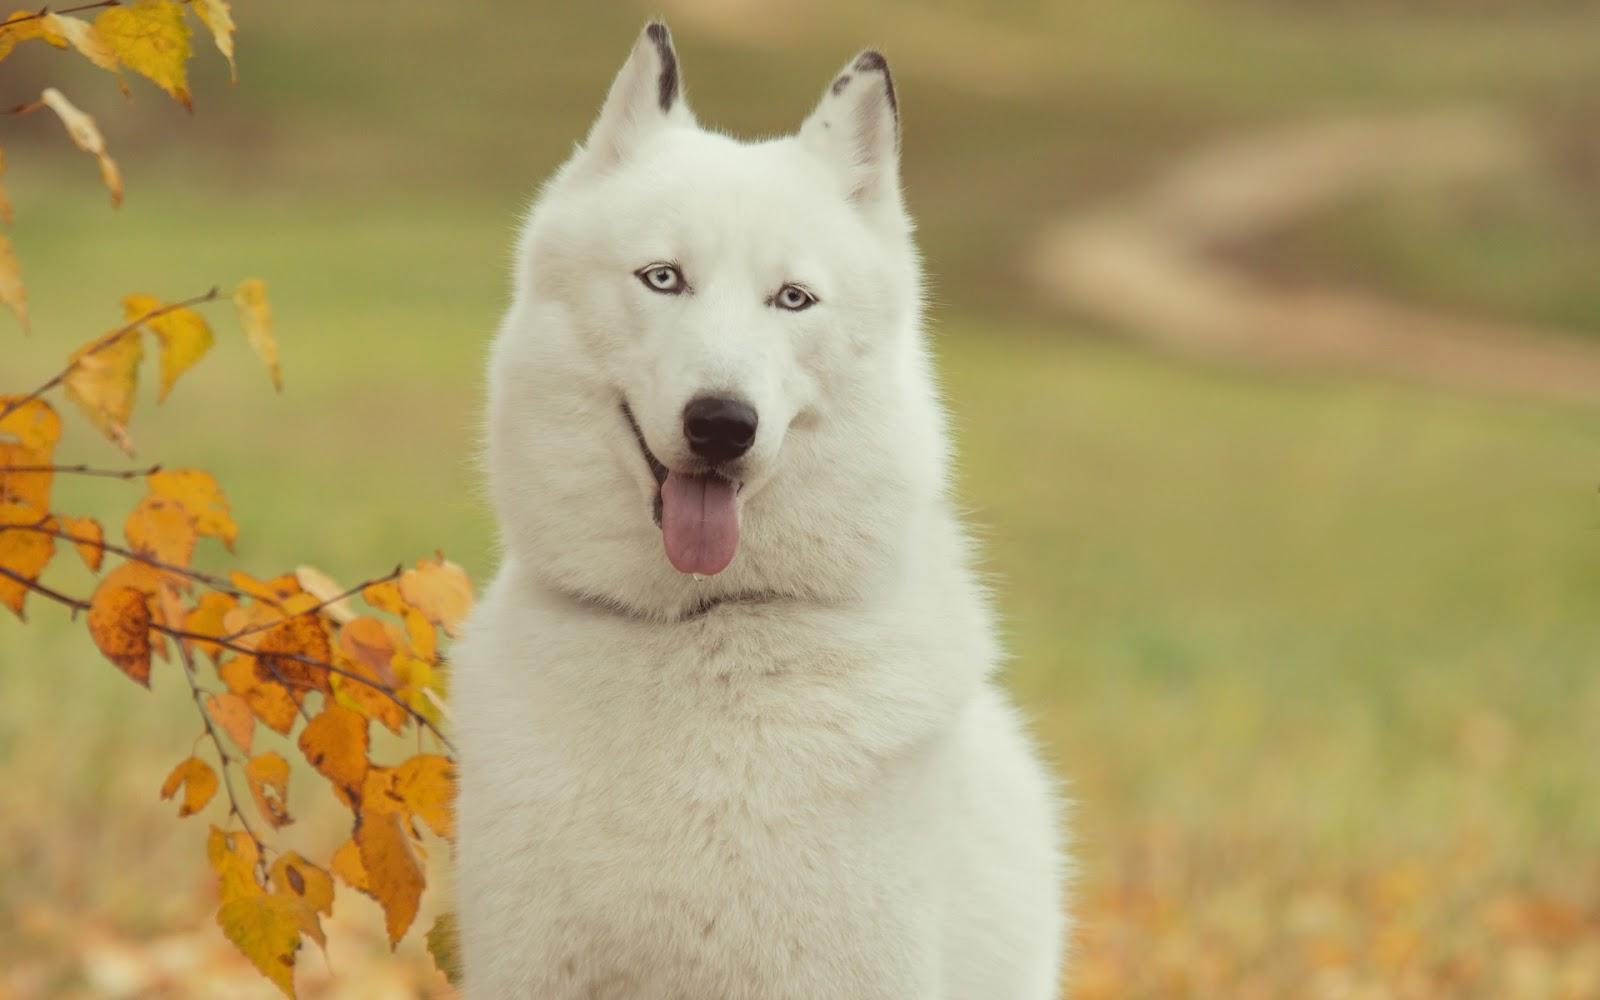 http://3.bp.blogspot.com/-T5eHPh01NkQ/T9N5O-n8aPI/AAAAAAAAe9Q/-7c63qGPdfc/s1600/Perro-Husky-Siberiano_Fondos-de-Pantalla-de-Animales.jpg